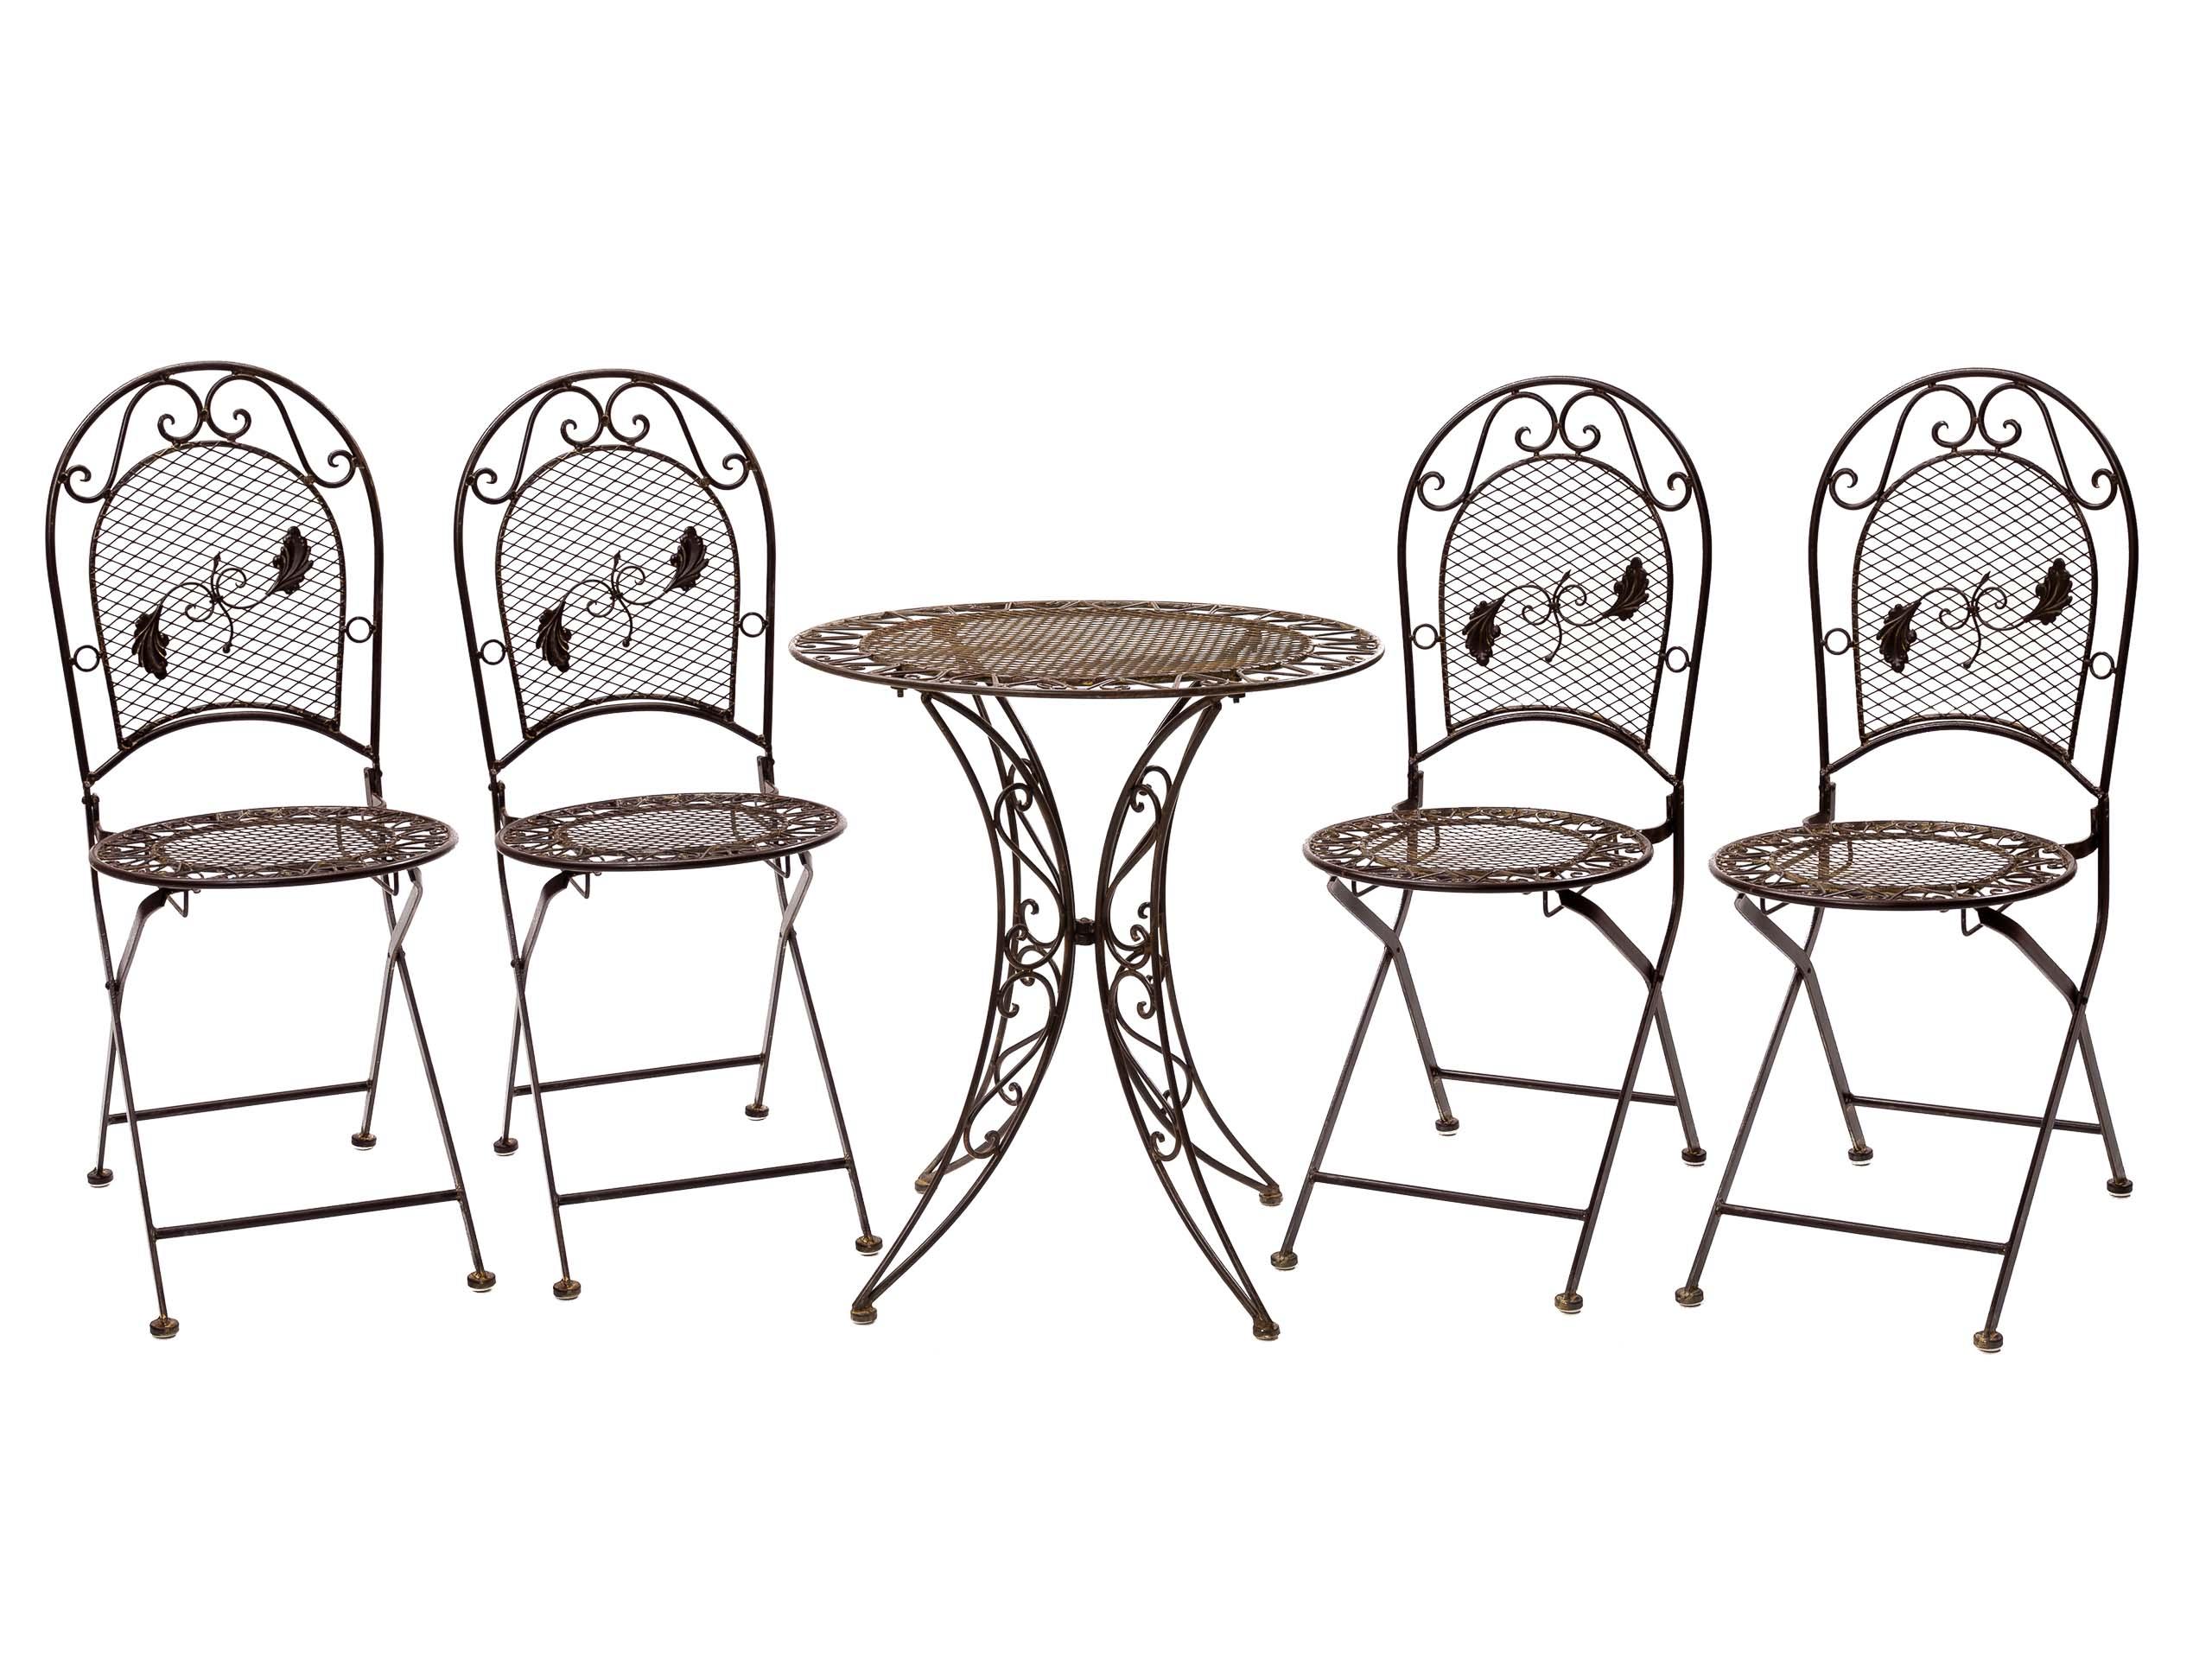 beste gartenbank metall nostalgie design ideen garten design ideen. Black Bedroom Furniture Sets. Home Design Ideas